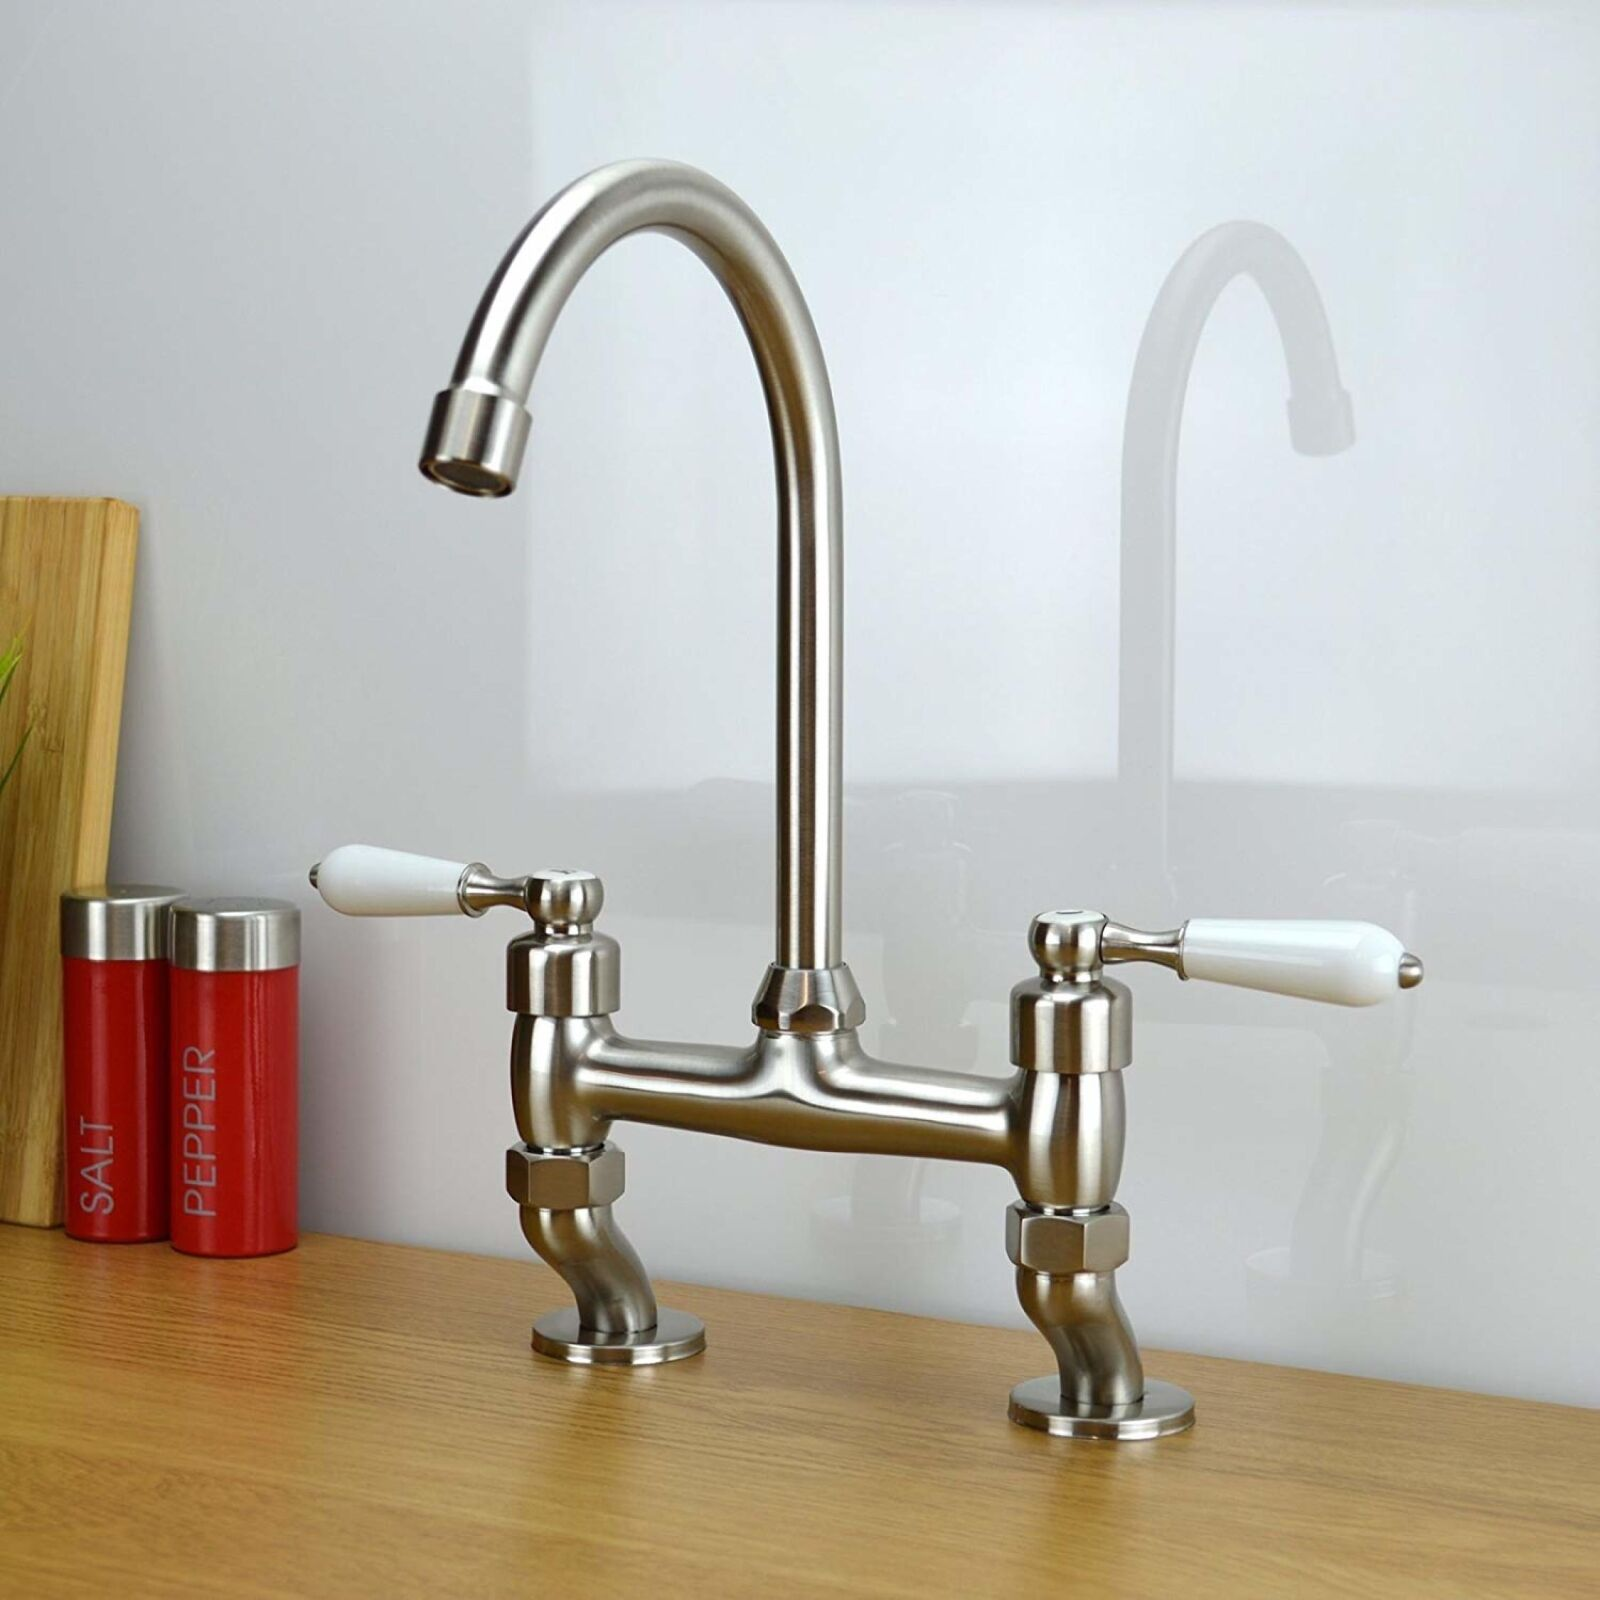 kitchen bridge tap.